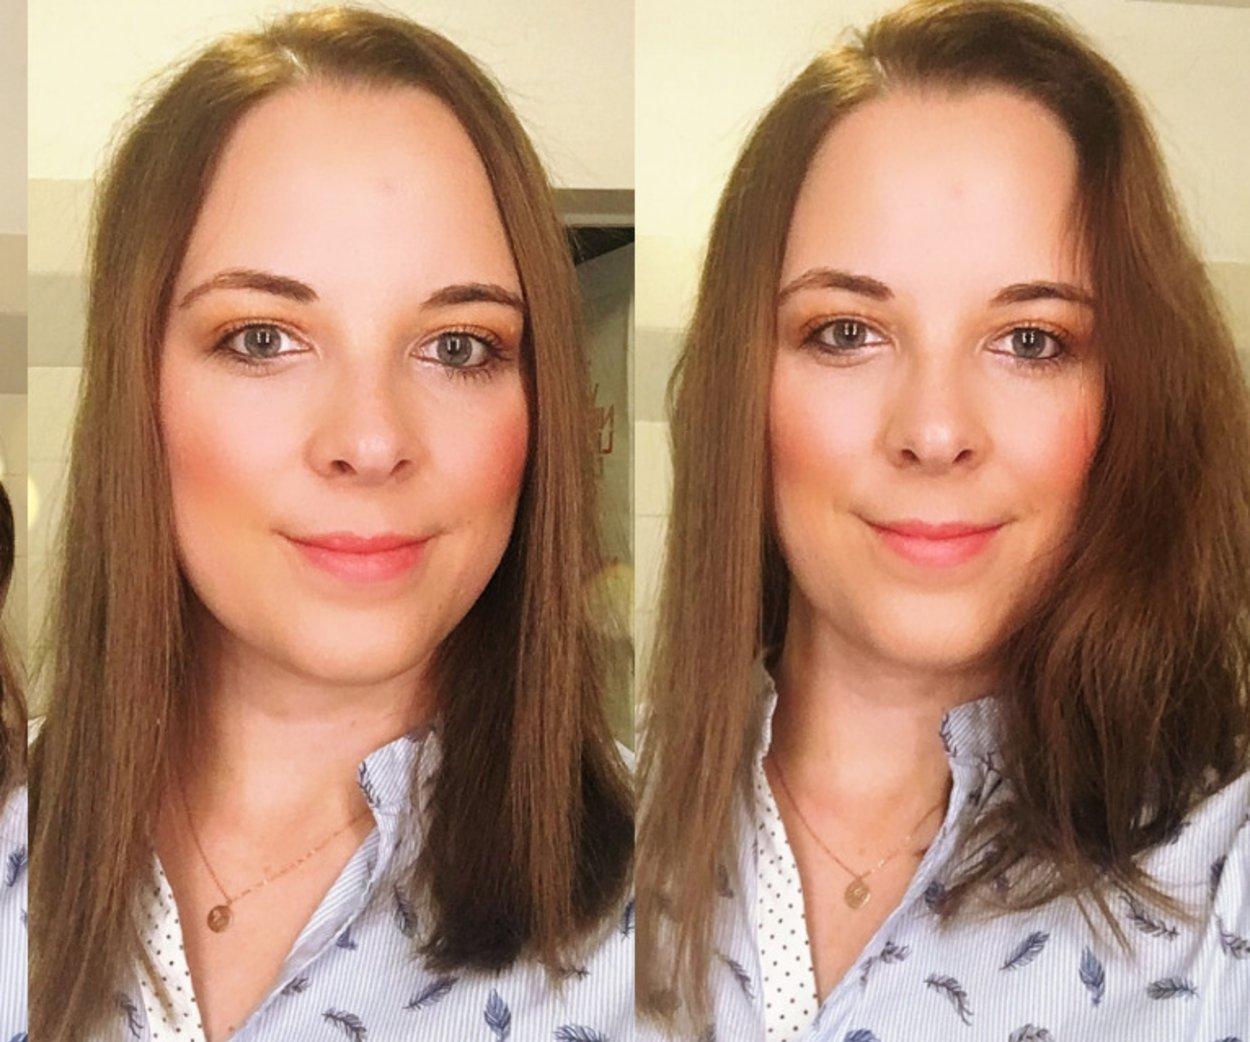 Frisuren Die Besten Looks Hairstyles Desired De